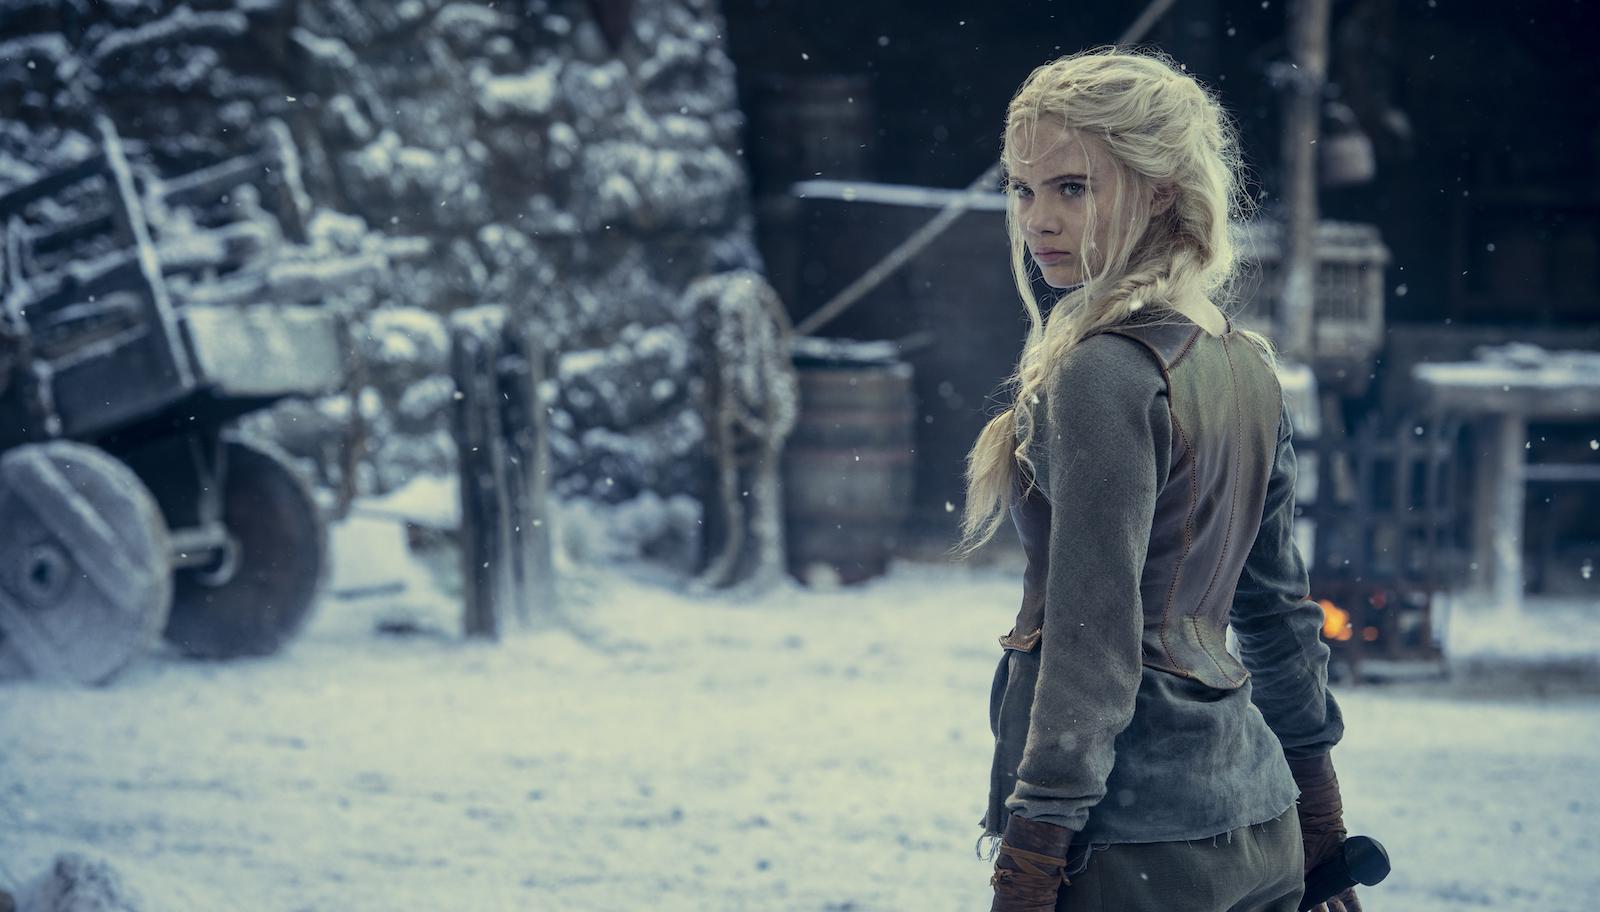 The Witcher Season 2 Trailer Showcases Ciri's Training - Den of Geek